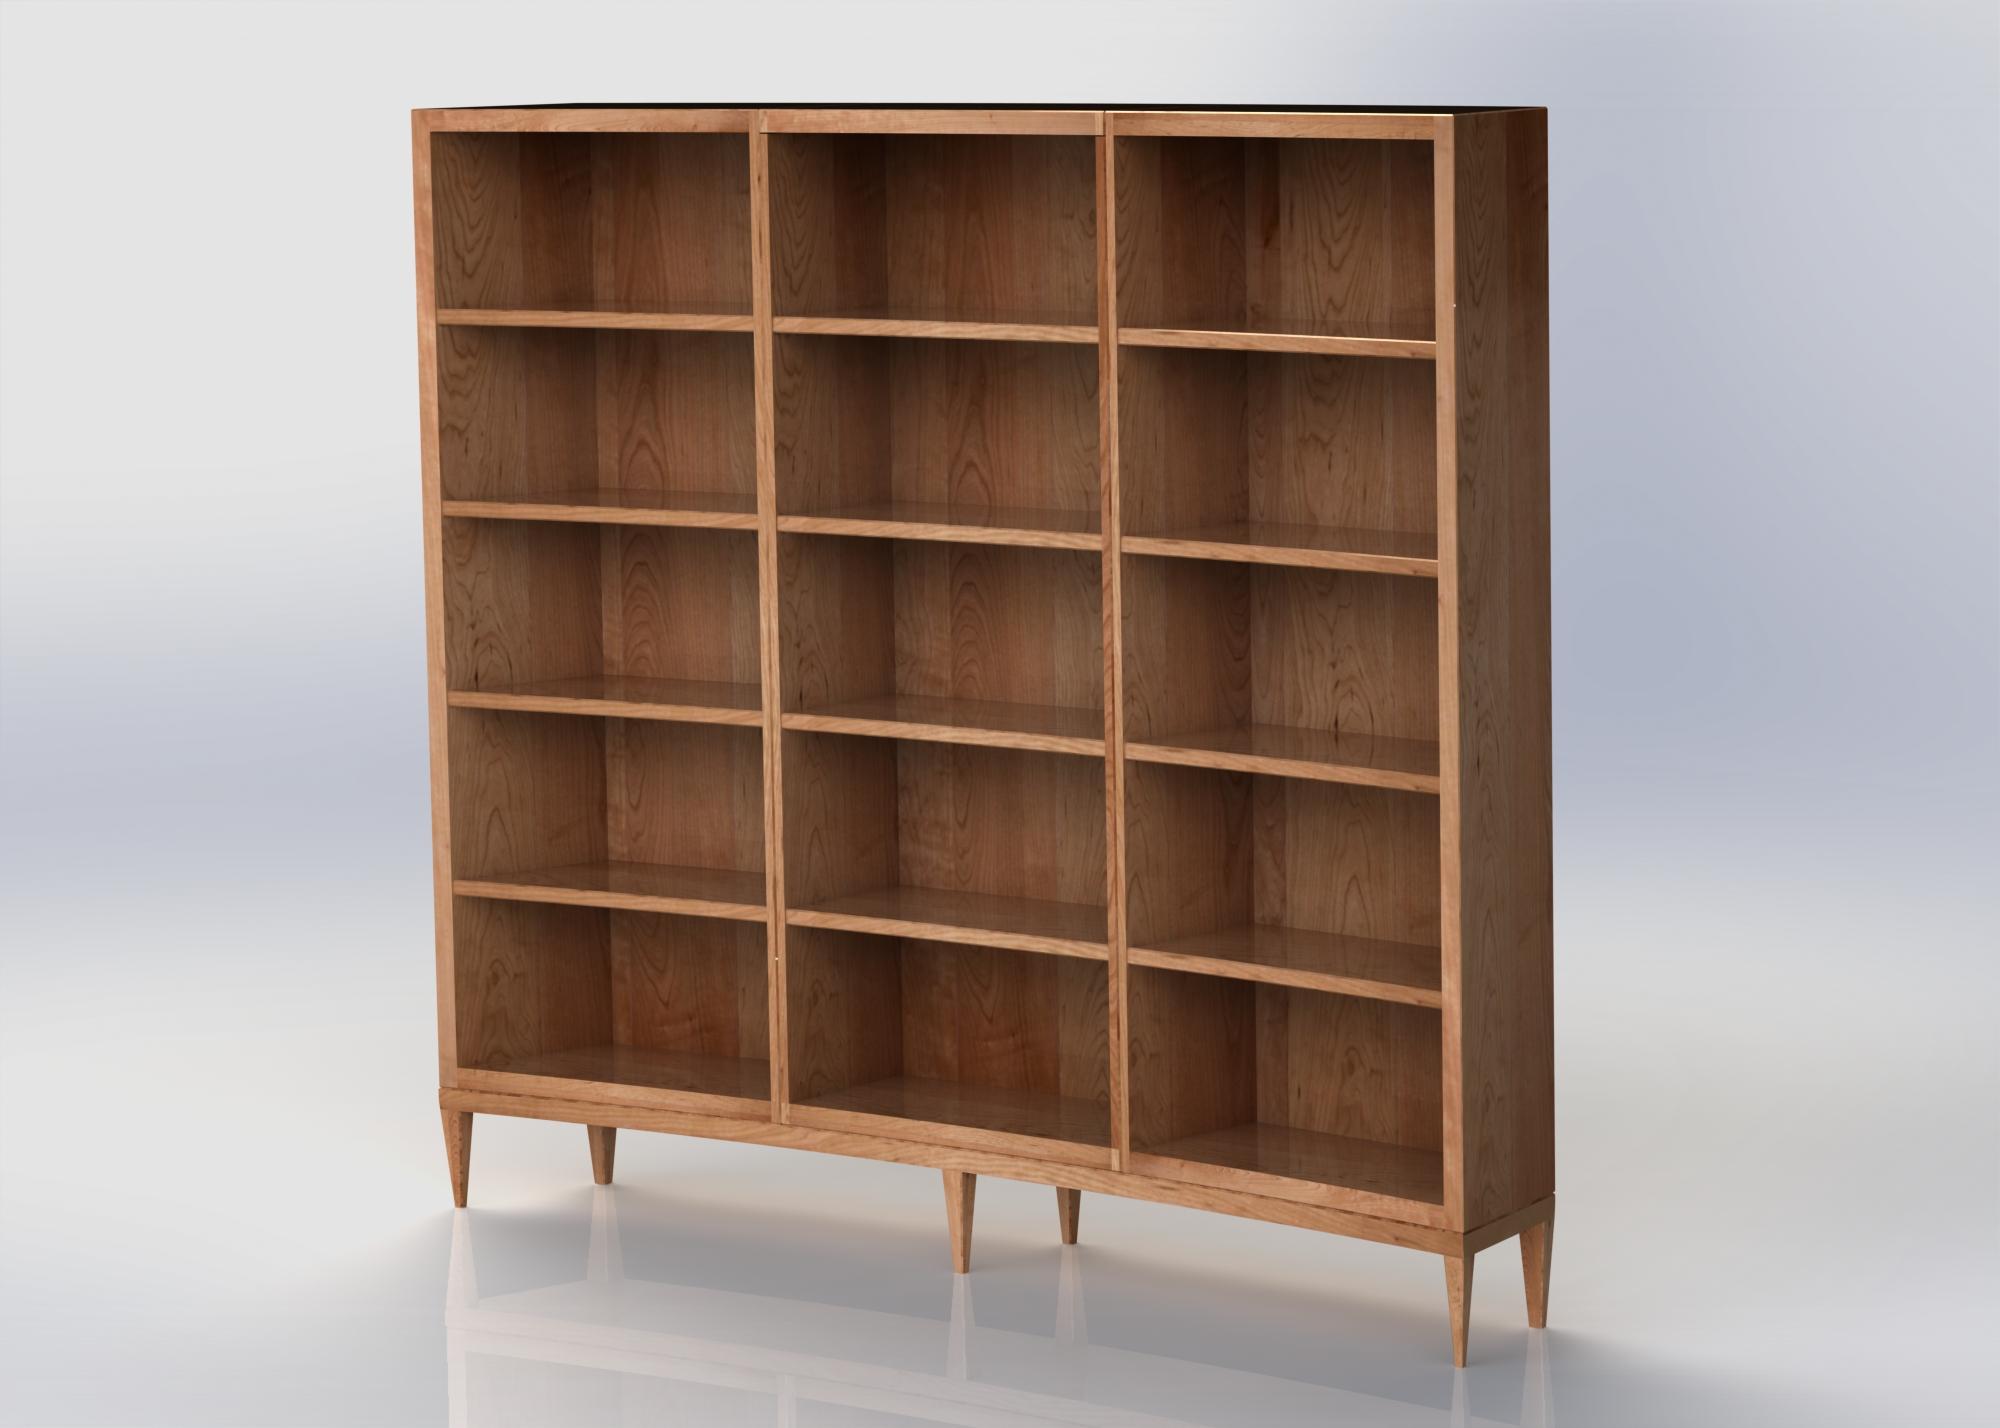 3_Part_Curved_Bookshelf_9_Small_Legs.JPG